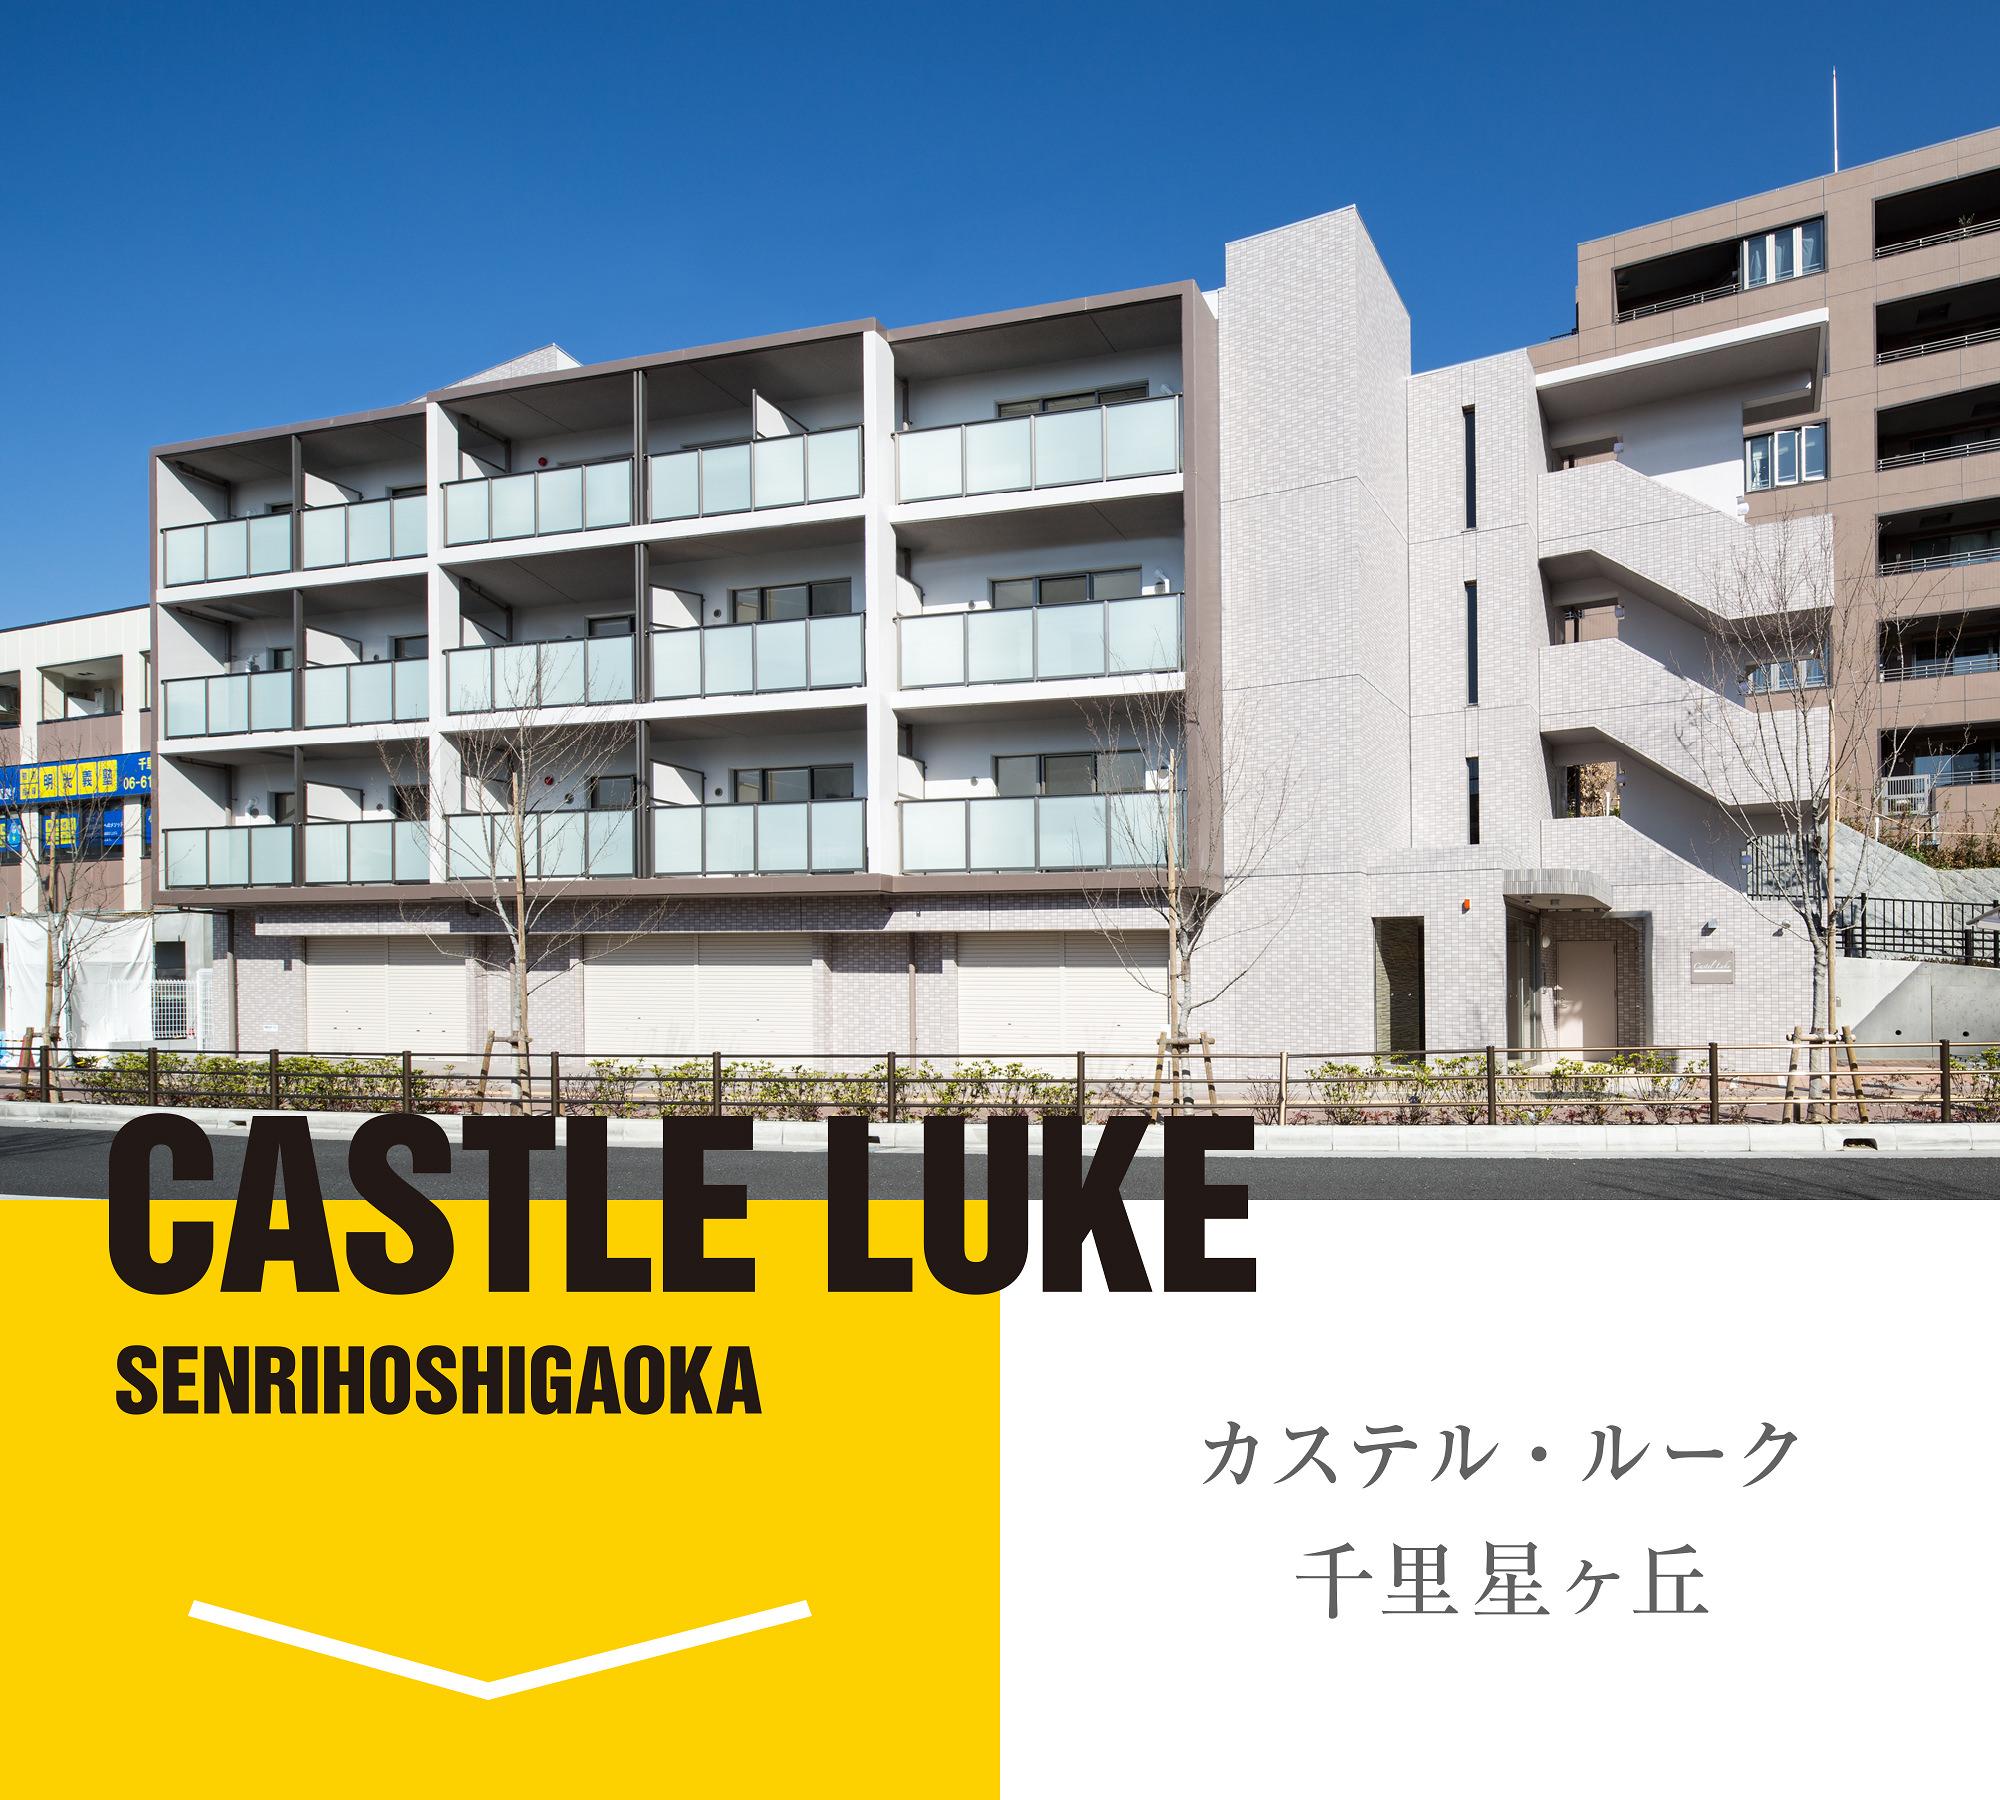 CASTELE LUKE 千里星ヶ丘